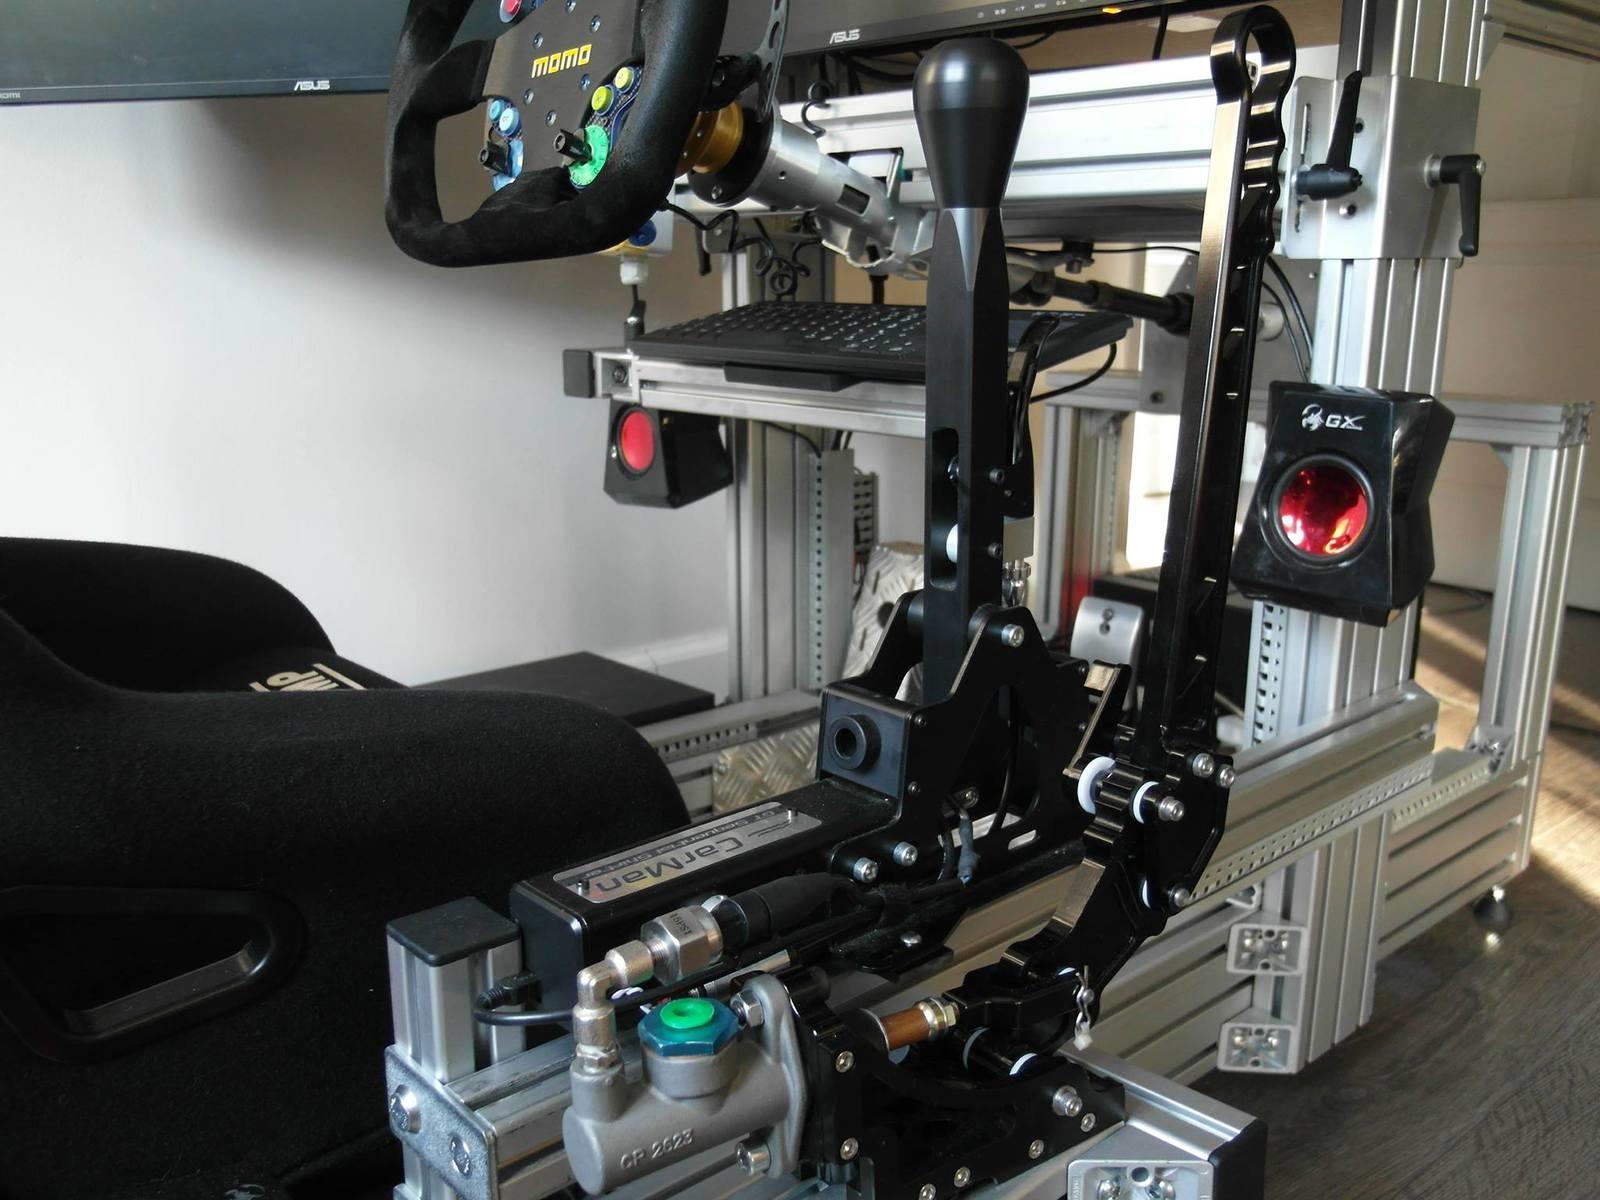 Le SimPro Handbrake installé avec un shifter Carman